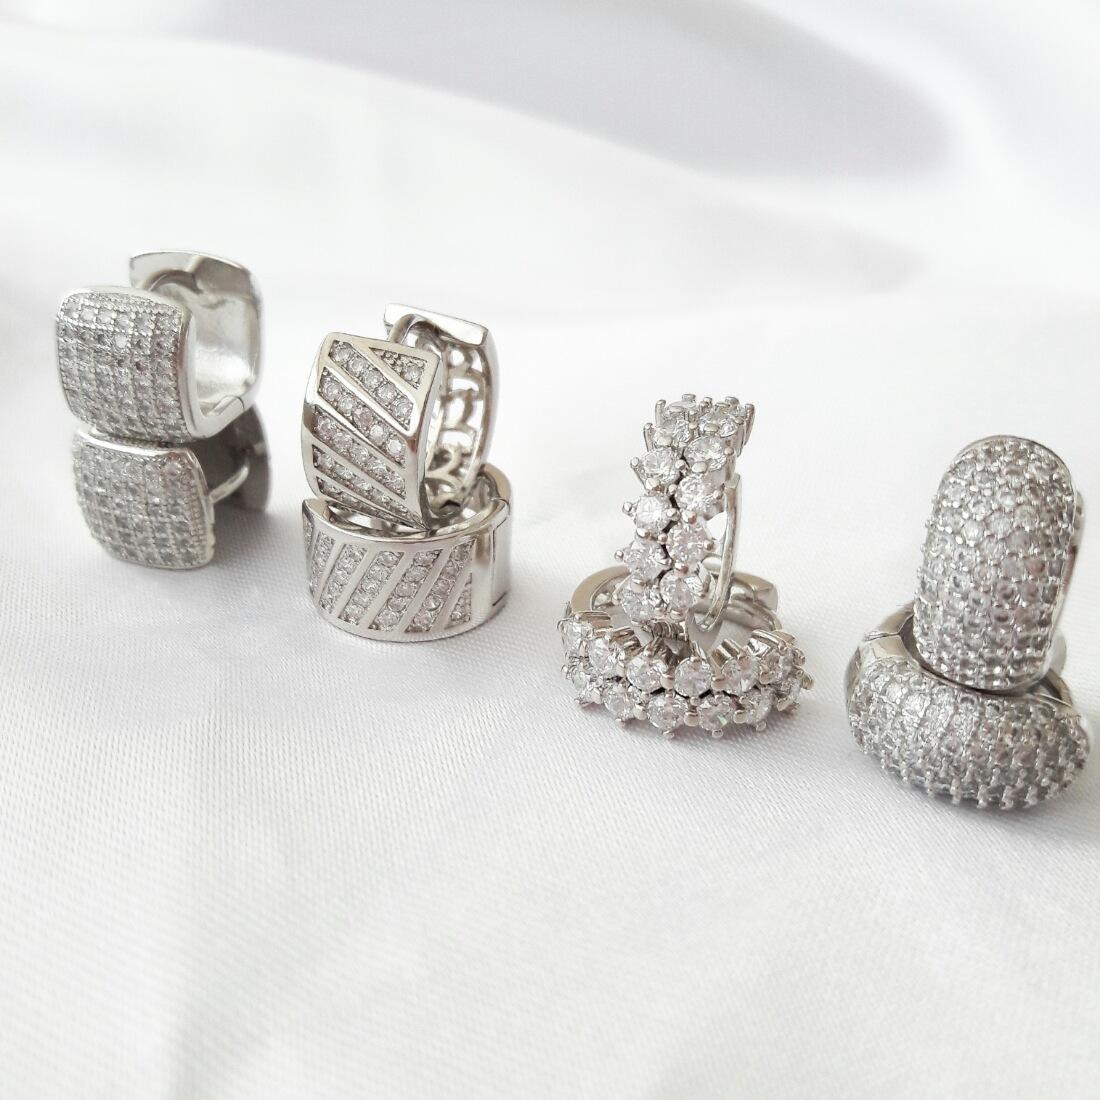 Argola Pequena Prata de Zircônia Cristal Semijoia Ródio Branco  - Soloyou